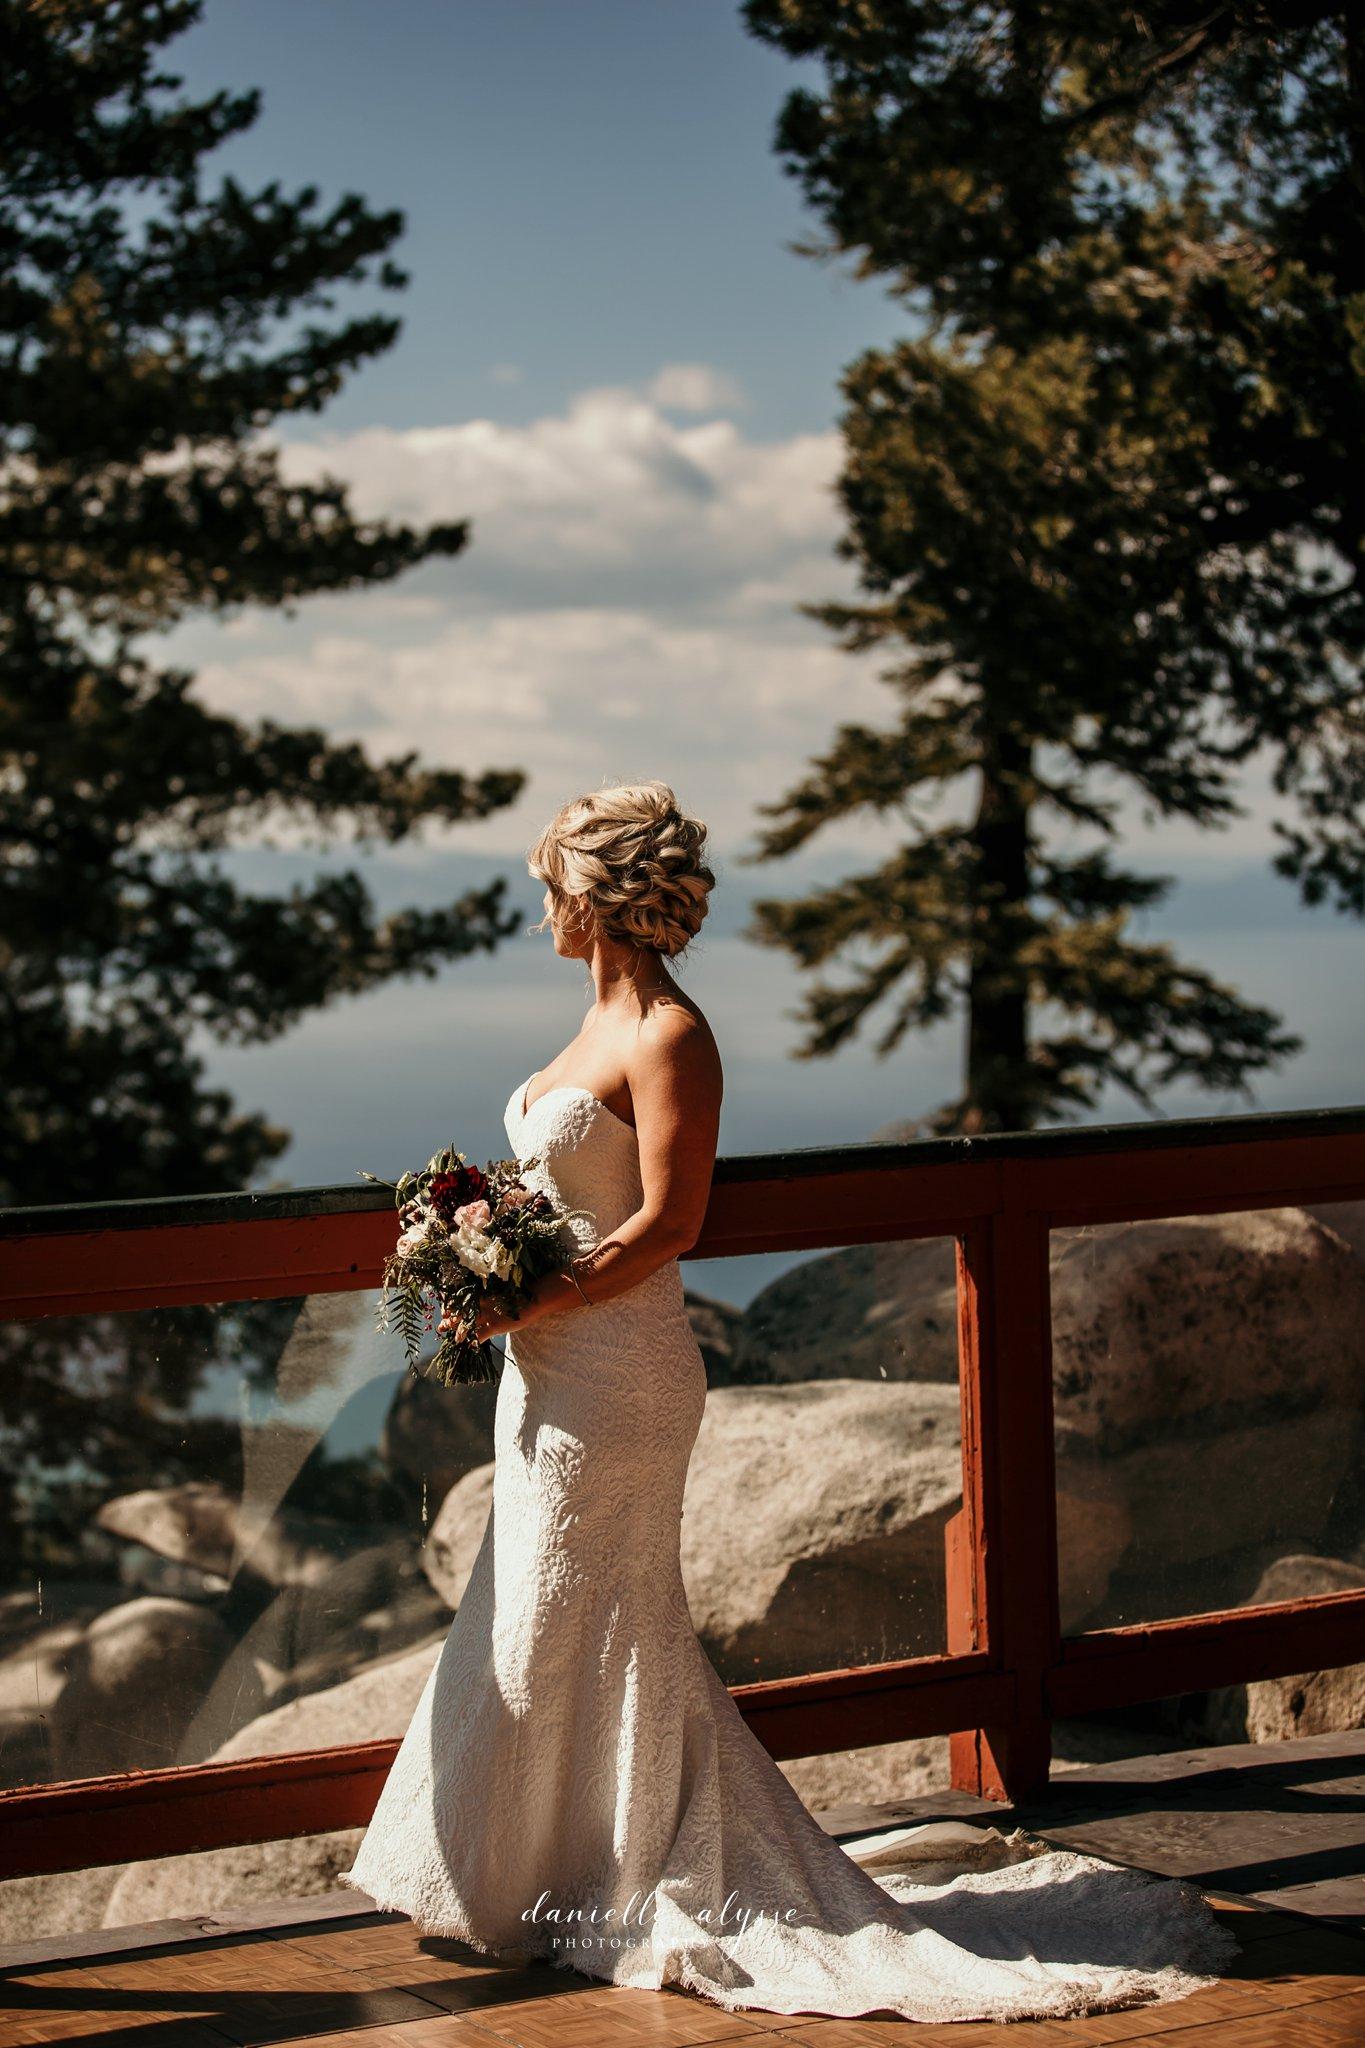 180831_wedding_stephanie_heavenly_south_lake_tahoe_danielle_alysse_photography_destination_blog_336_WEB.jpg